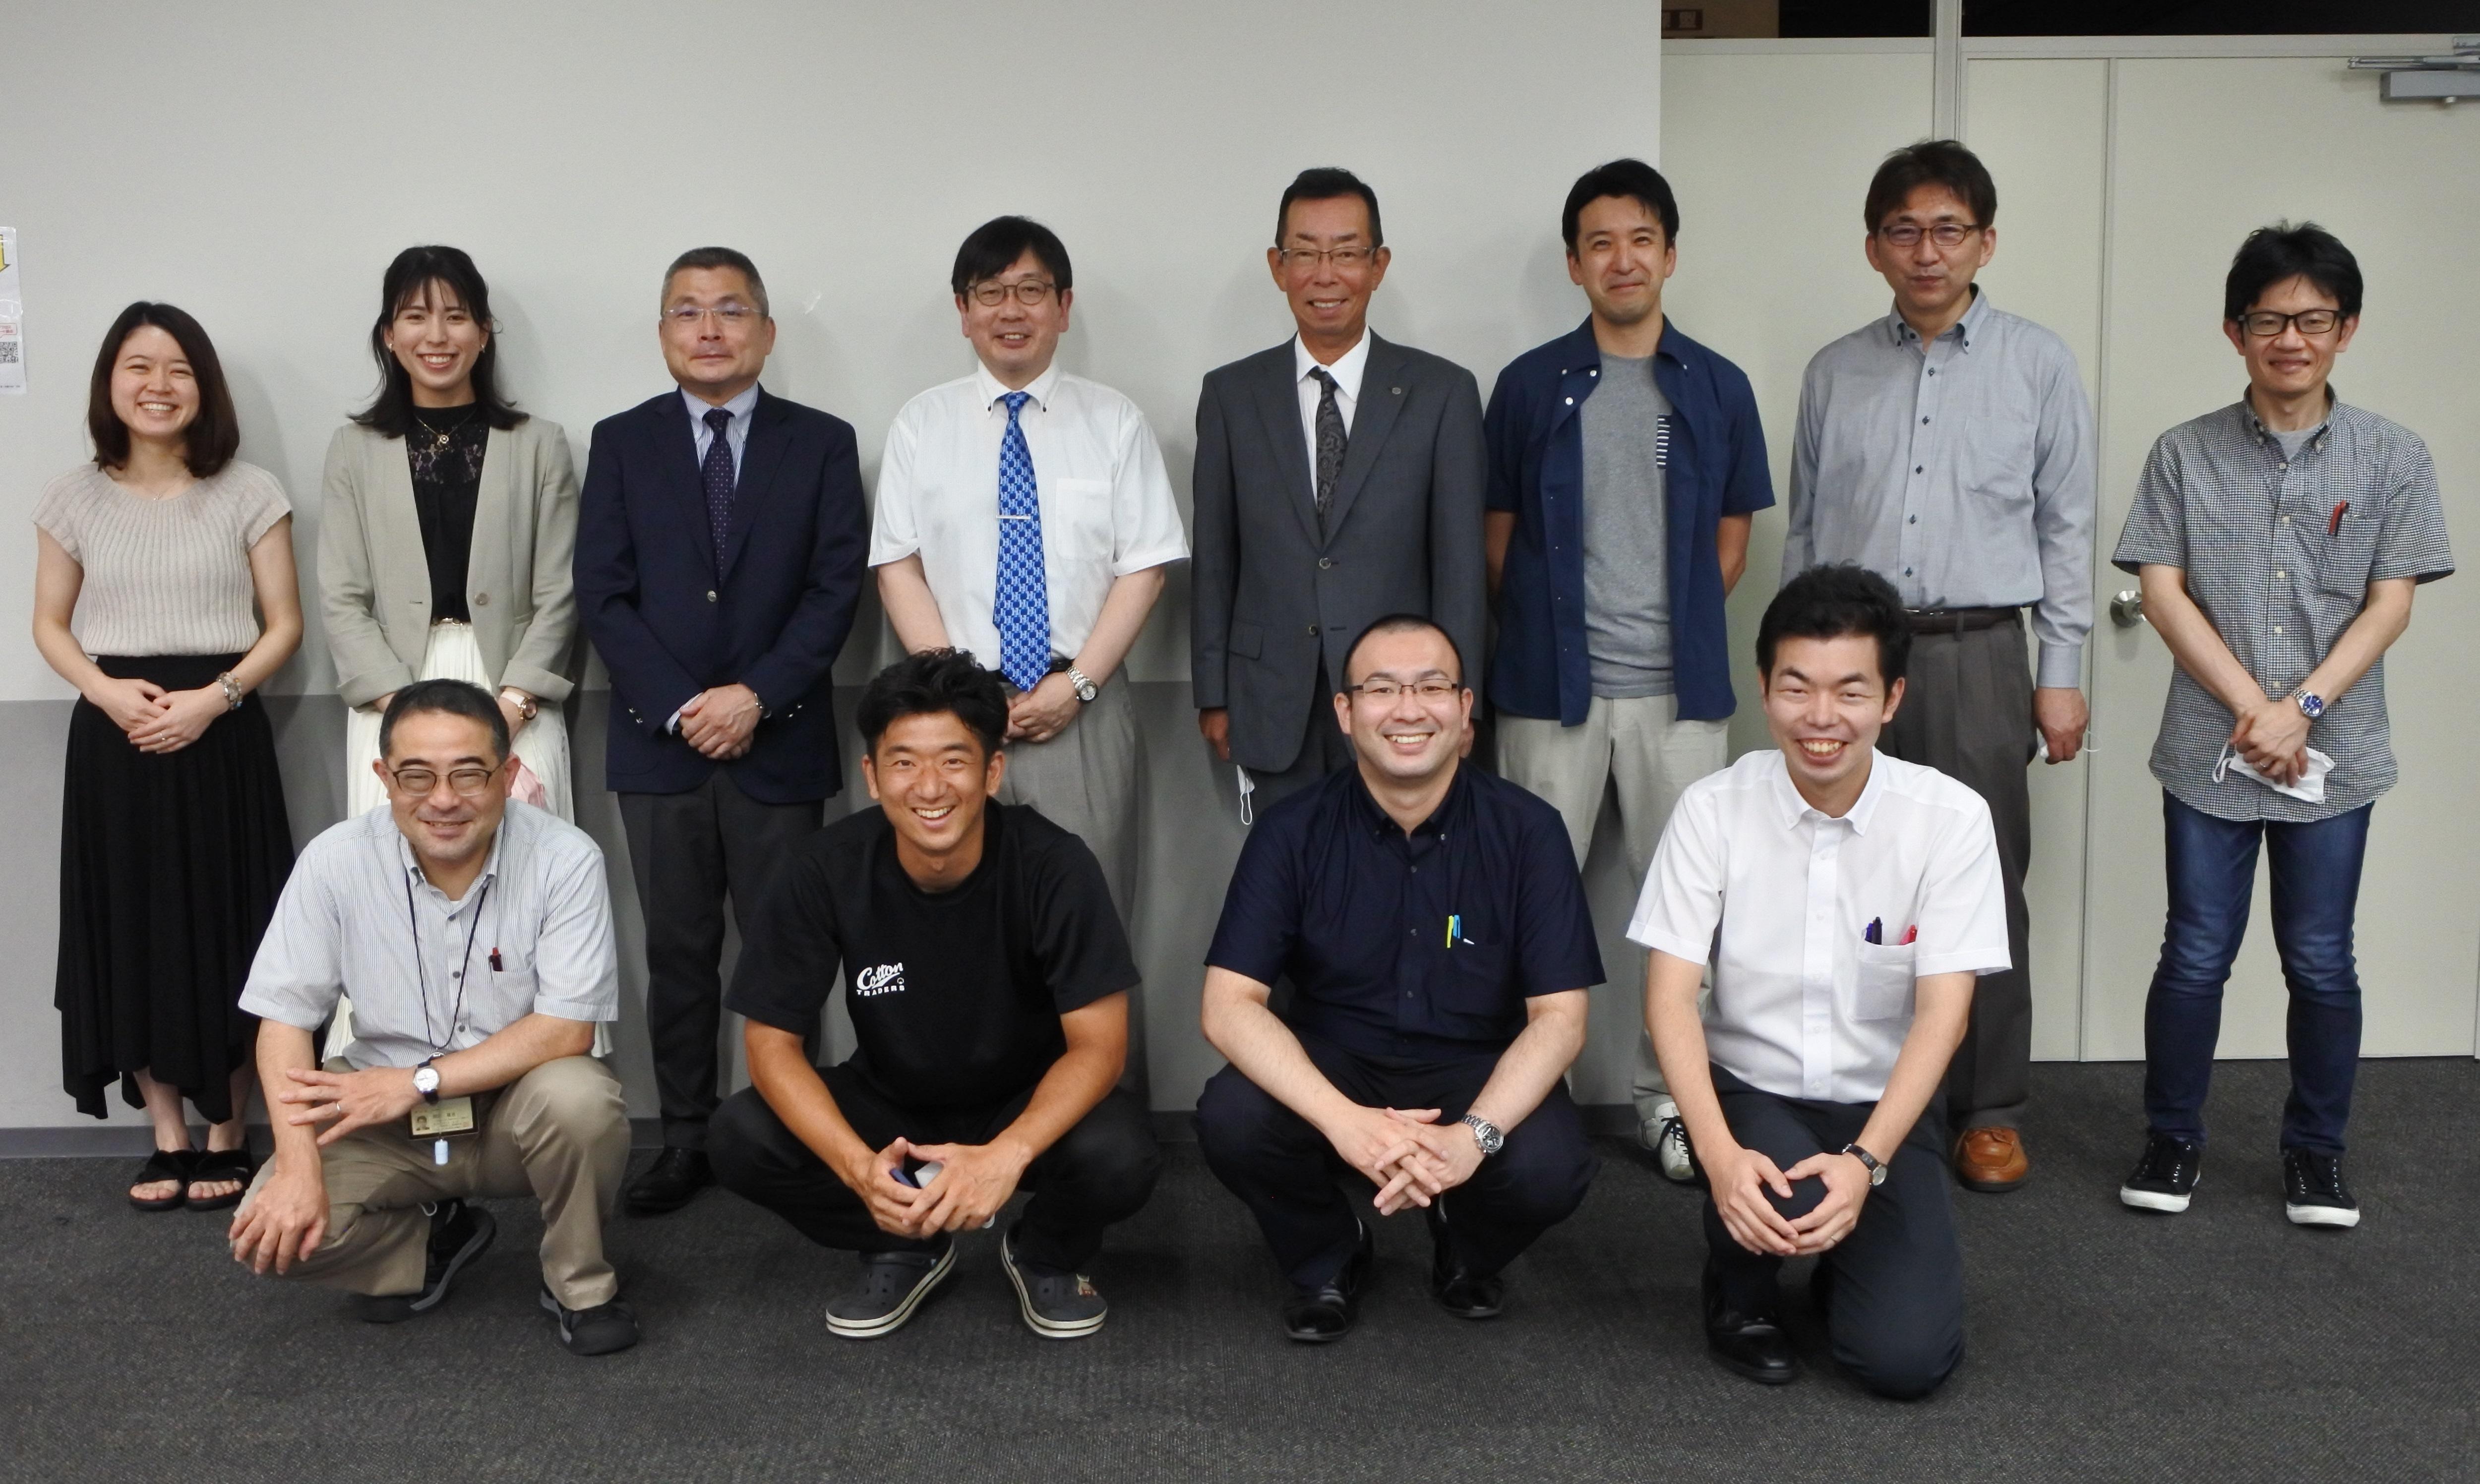 WEB講演会を終えた神野透人教授(後列左から4人目)、丹下富博薬学部同窓会長(同5人目)ら